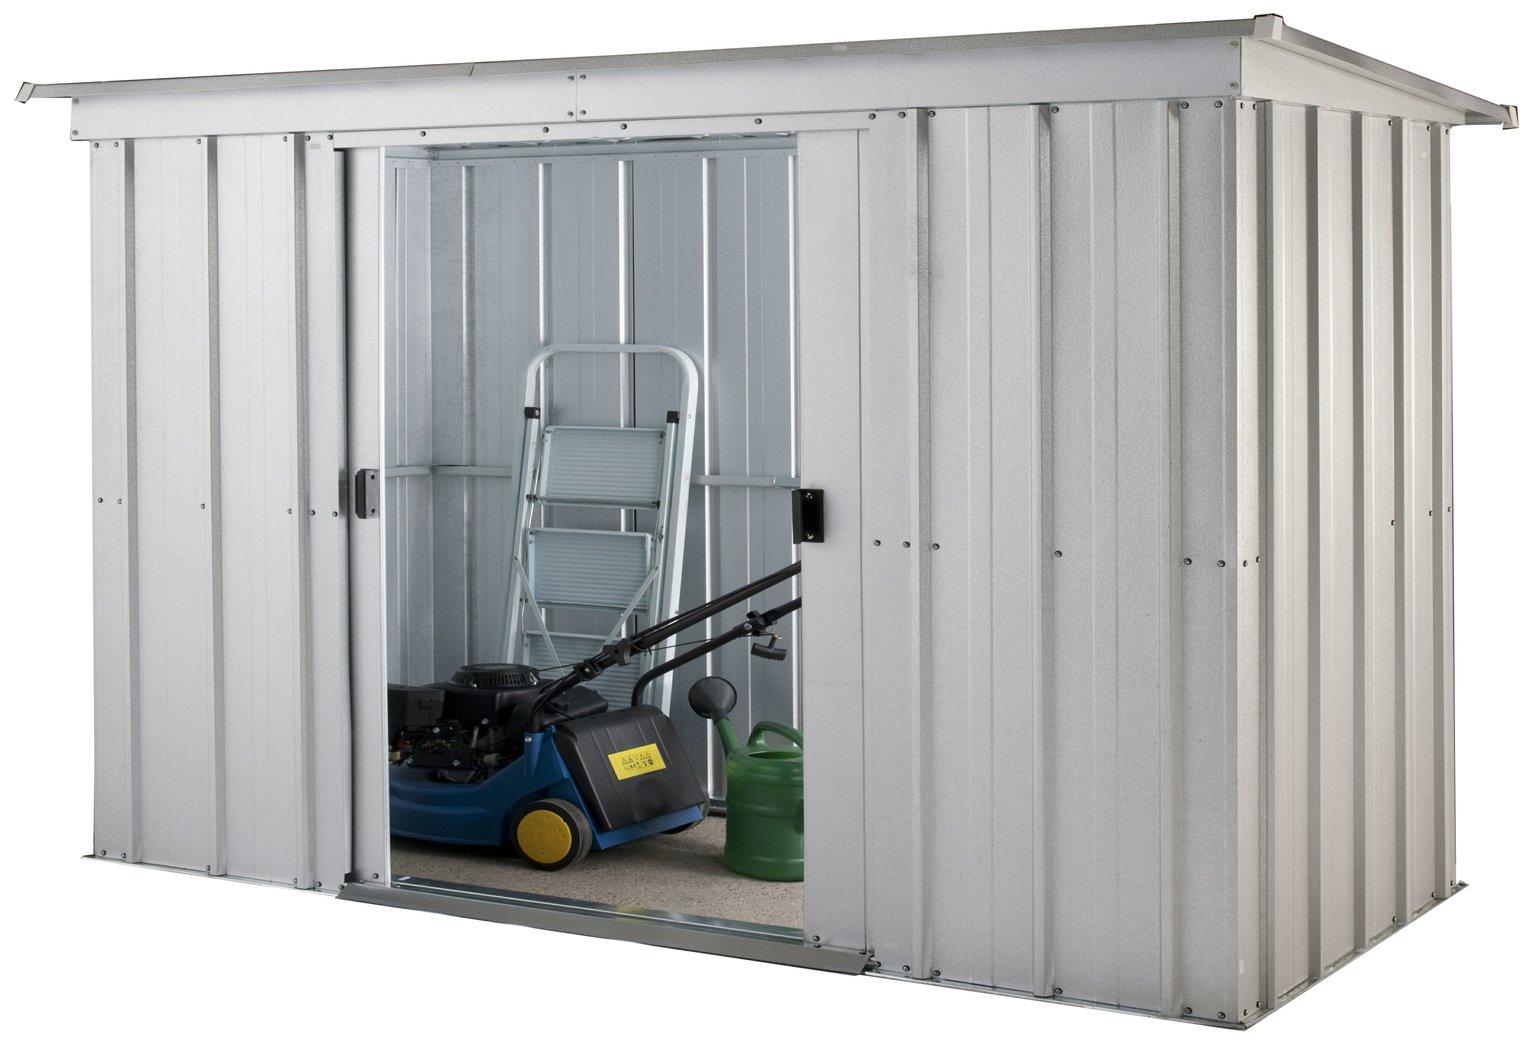 sc 1 st  Argos & Buy Yardmaster Pent Metal Garden Storage Unit - 6 x 4ft | Sheds | Argos